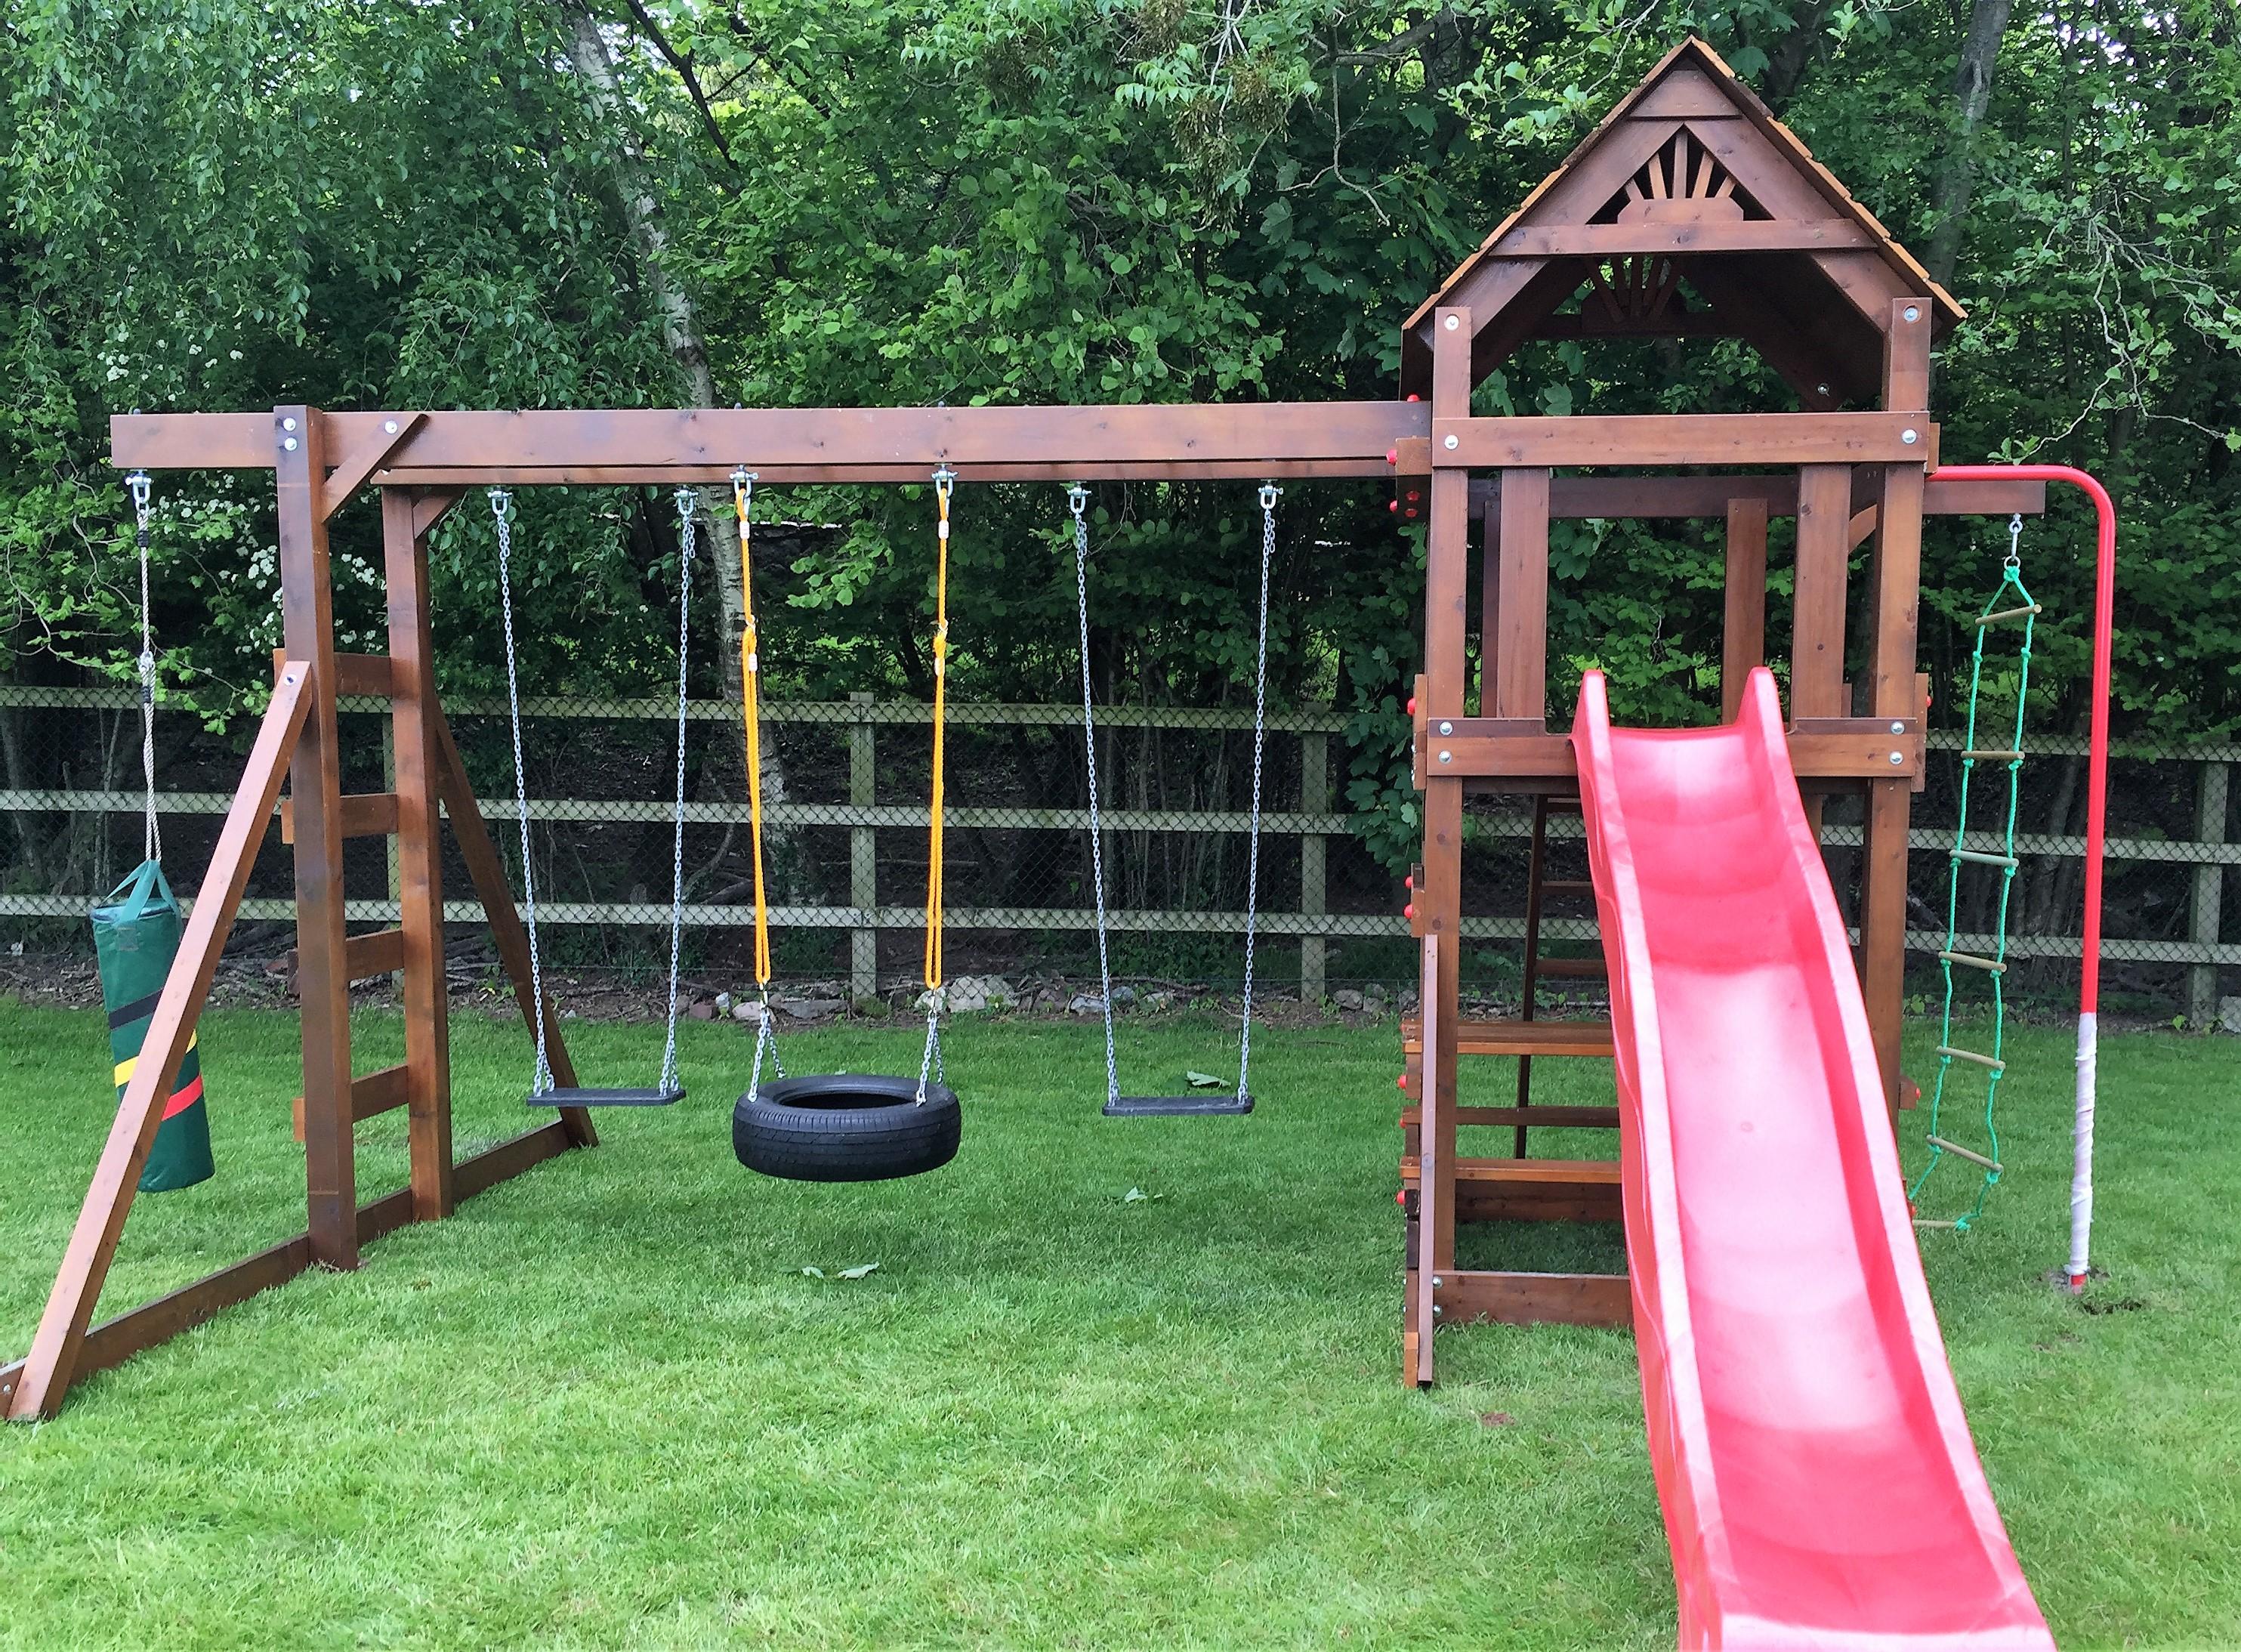 Play tower,monkey bar swing beam punching boxing bag ,fireman's pole, climbing ladder ,wave slide, access ladder,swing seats